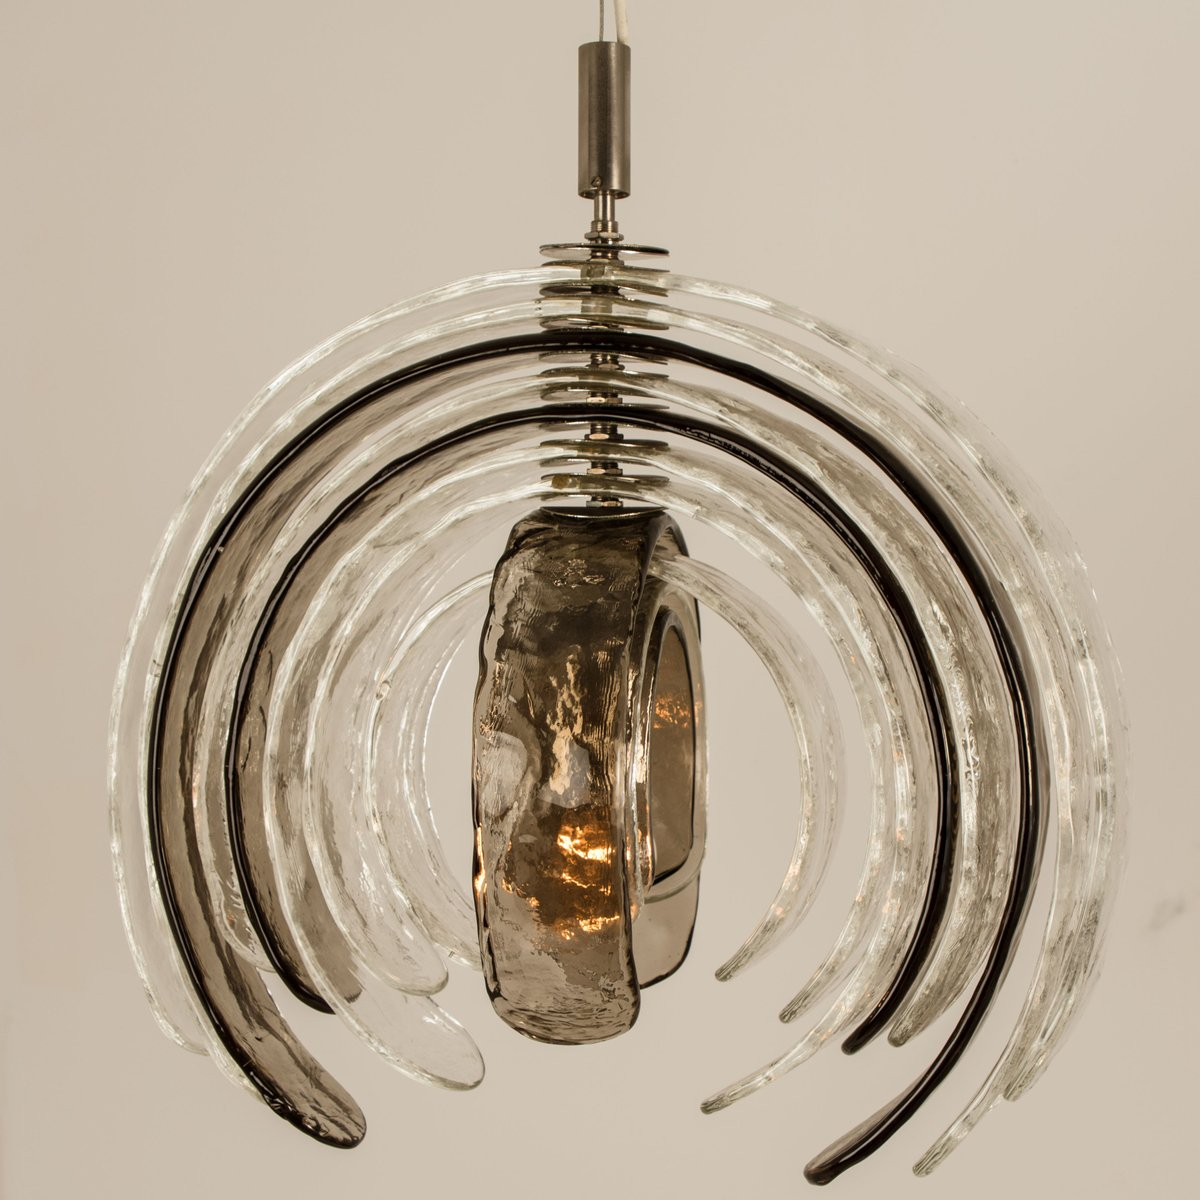 skulpturale artichoke lampen von carlo nason f r mazzega 1970er 2er set bei pamono kaufen. Black Bedroom Furniture Sets. Home Design Ideas